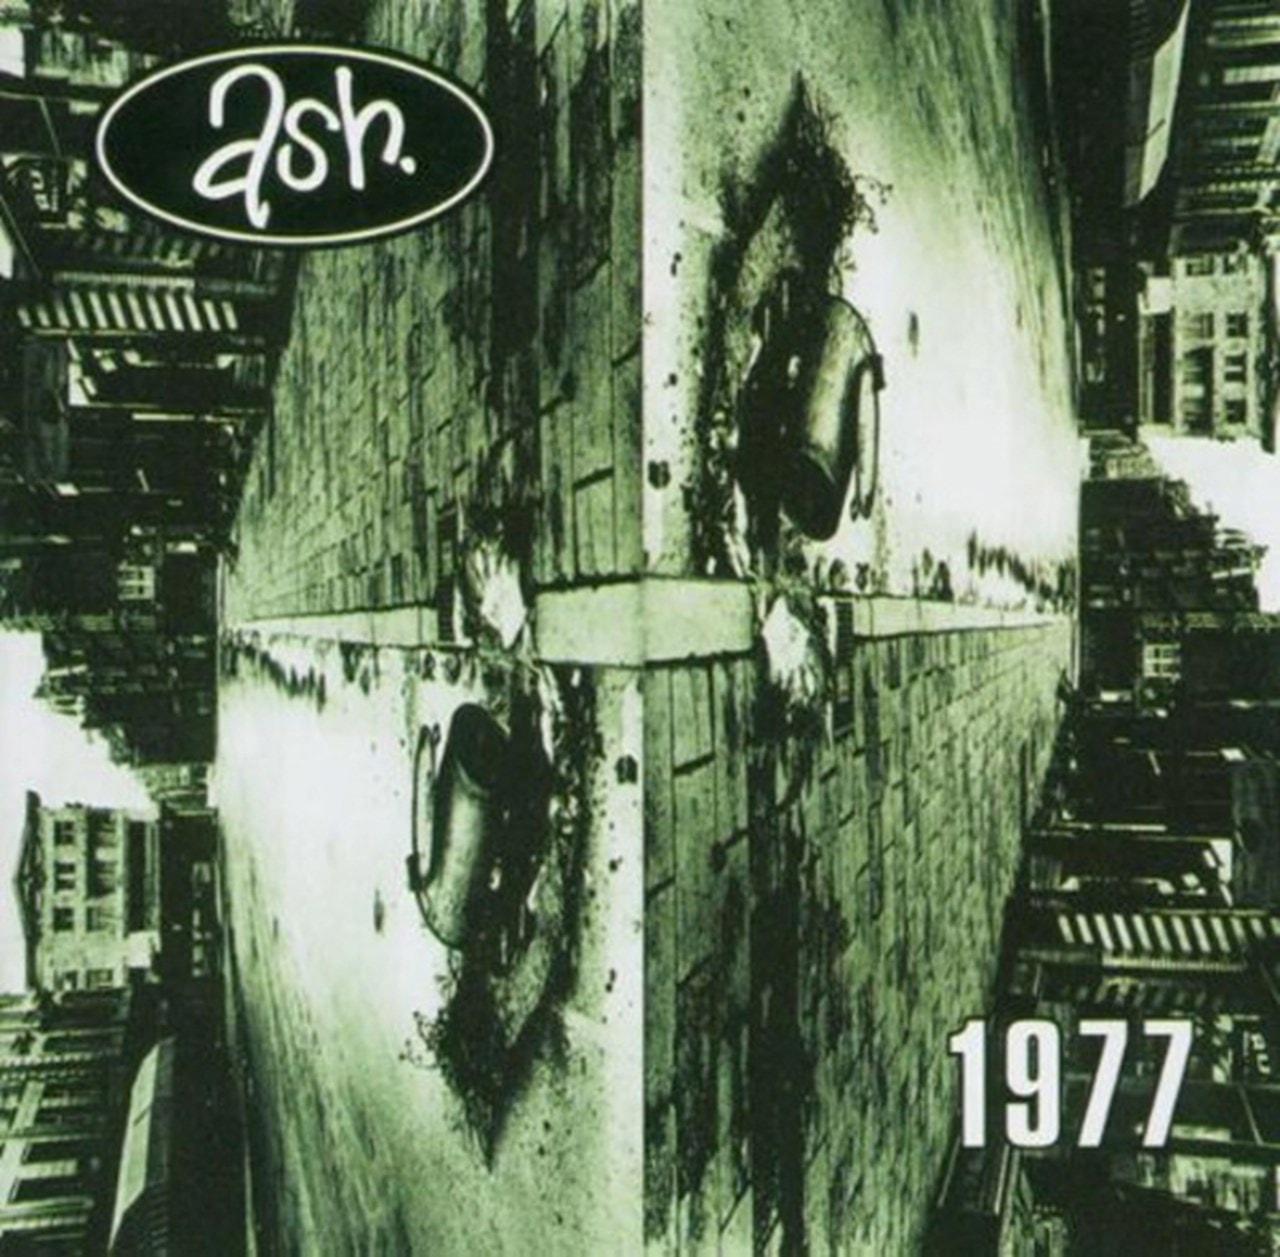 1977 - 1